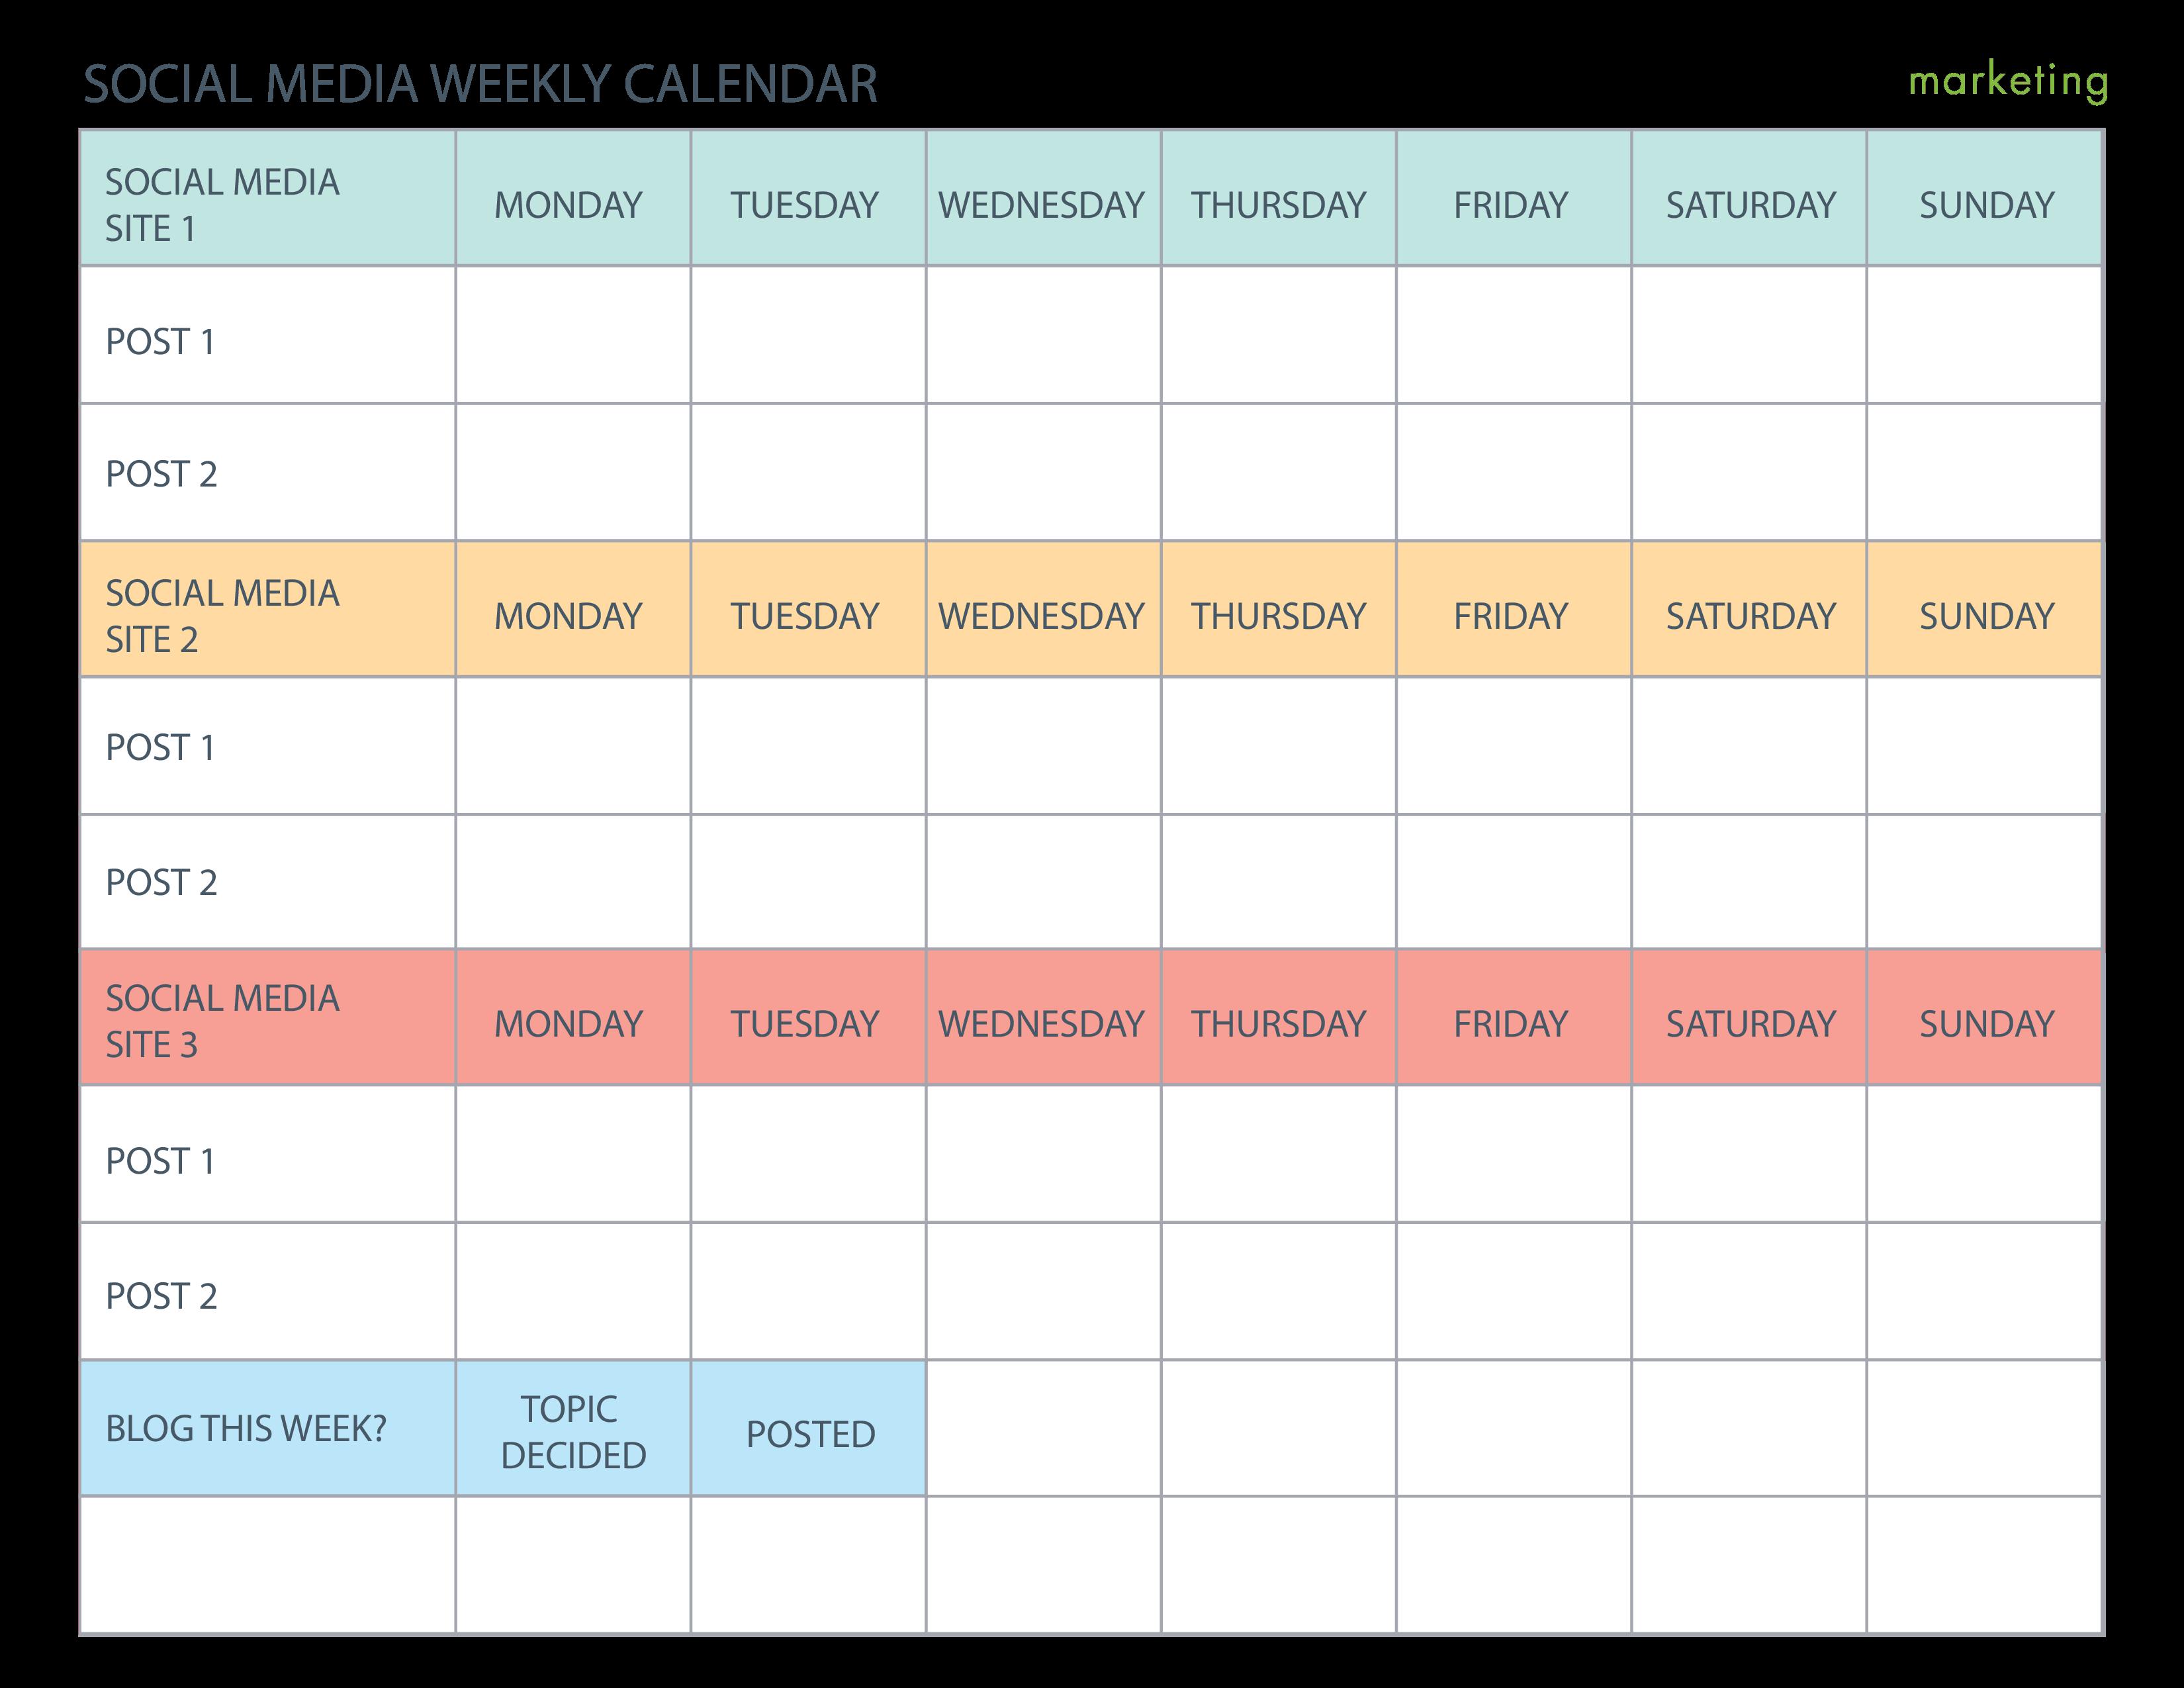 Weekly Social Media Calendar   Templates at allbusinesstemplates ...